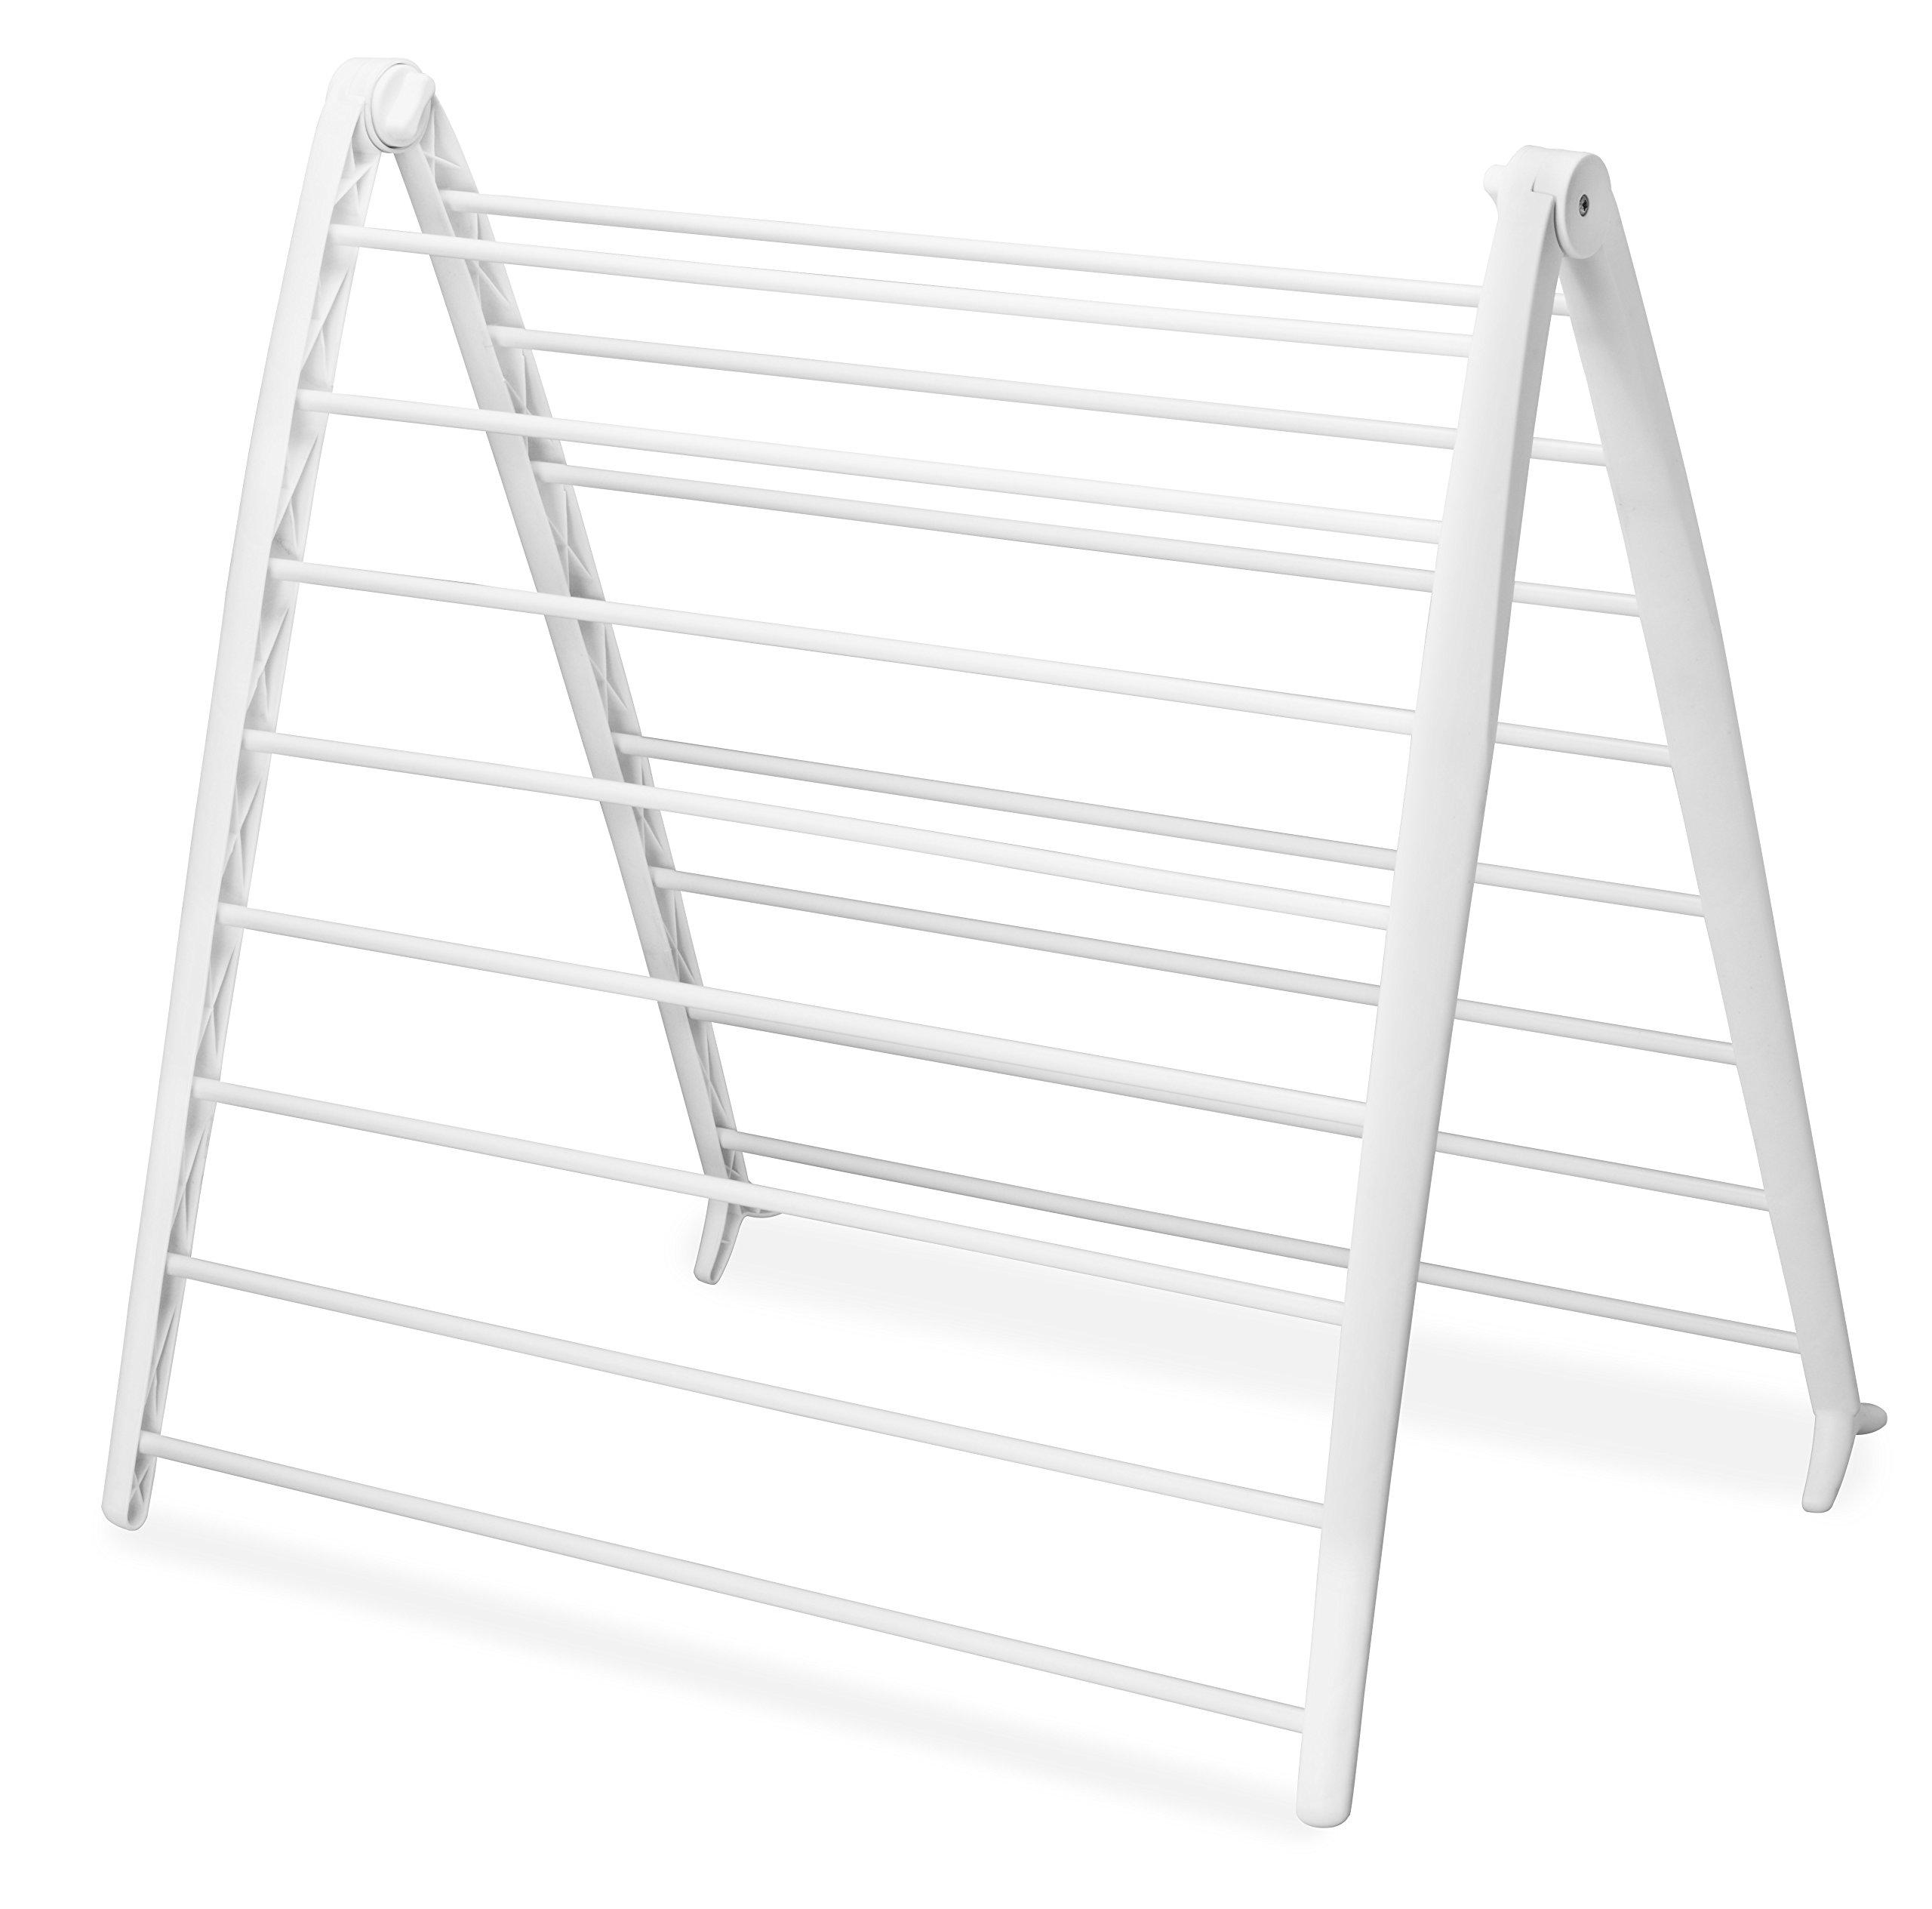 Whitmor Drying Rack, Collapsible, White